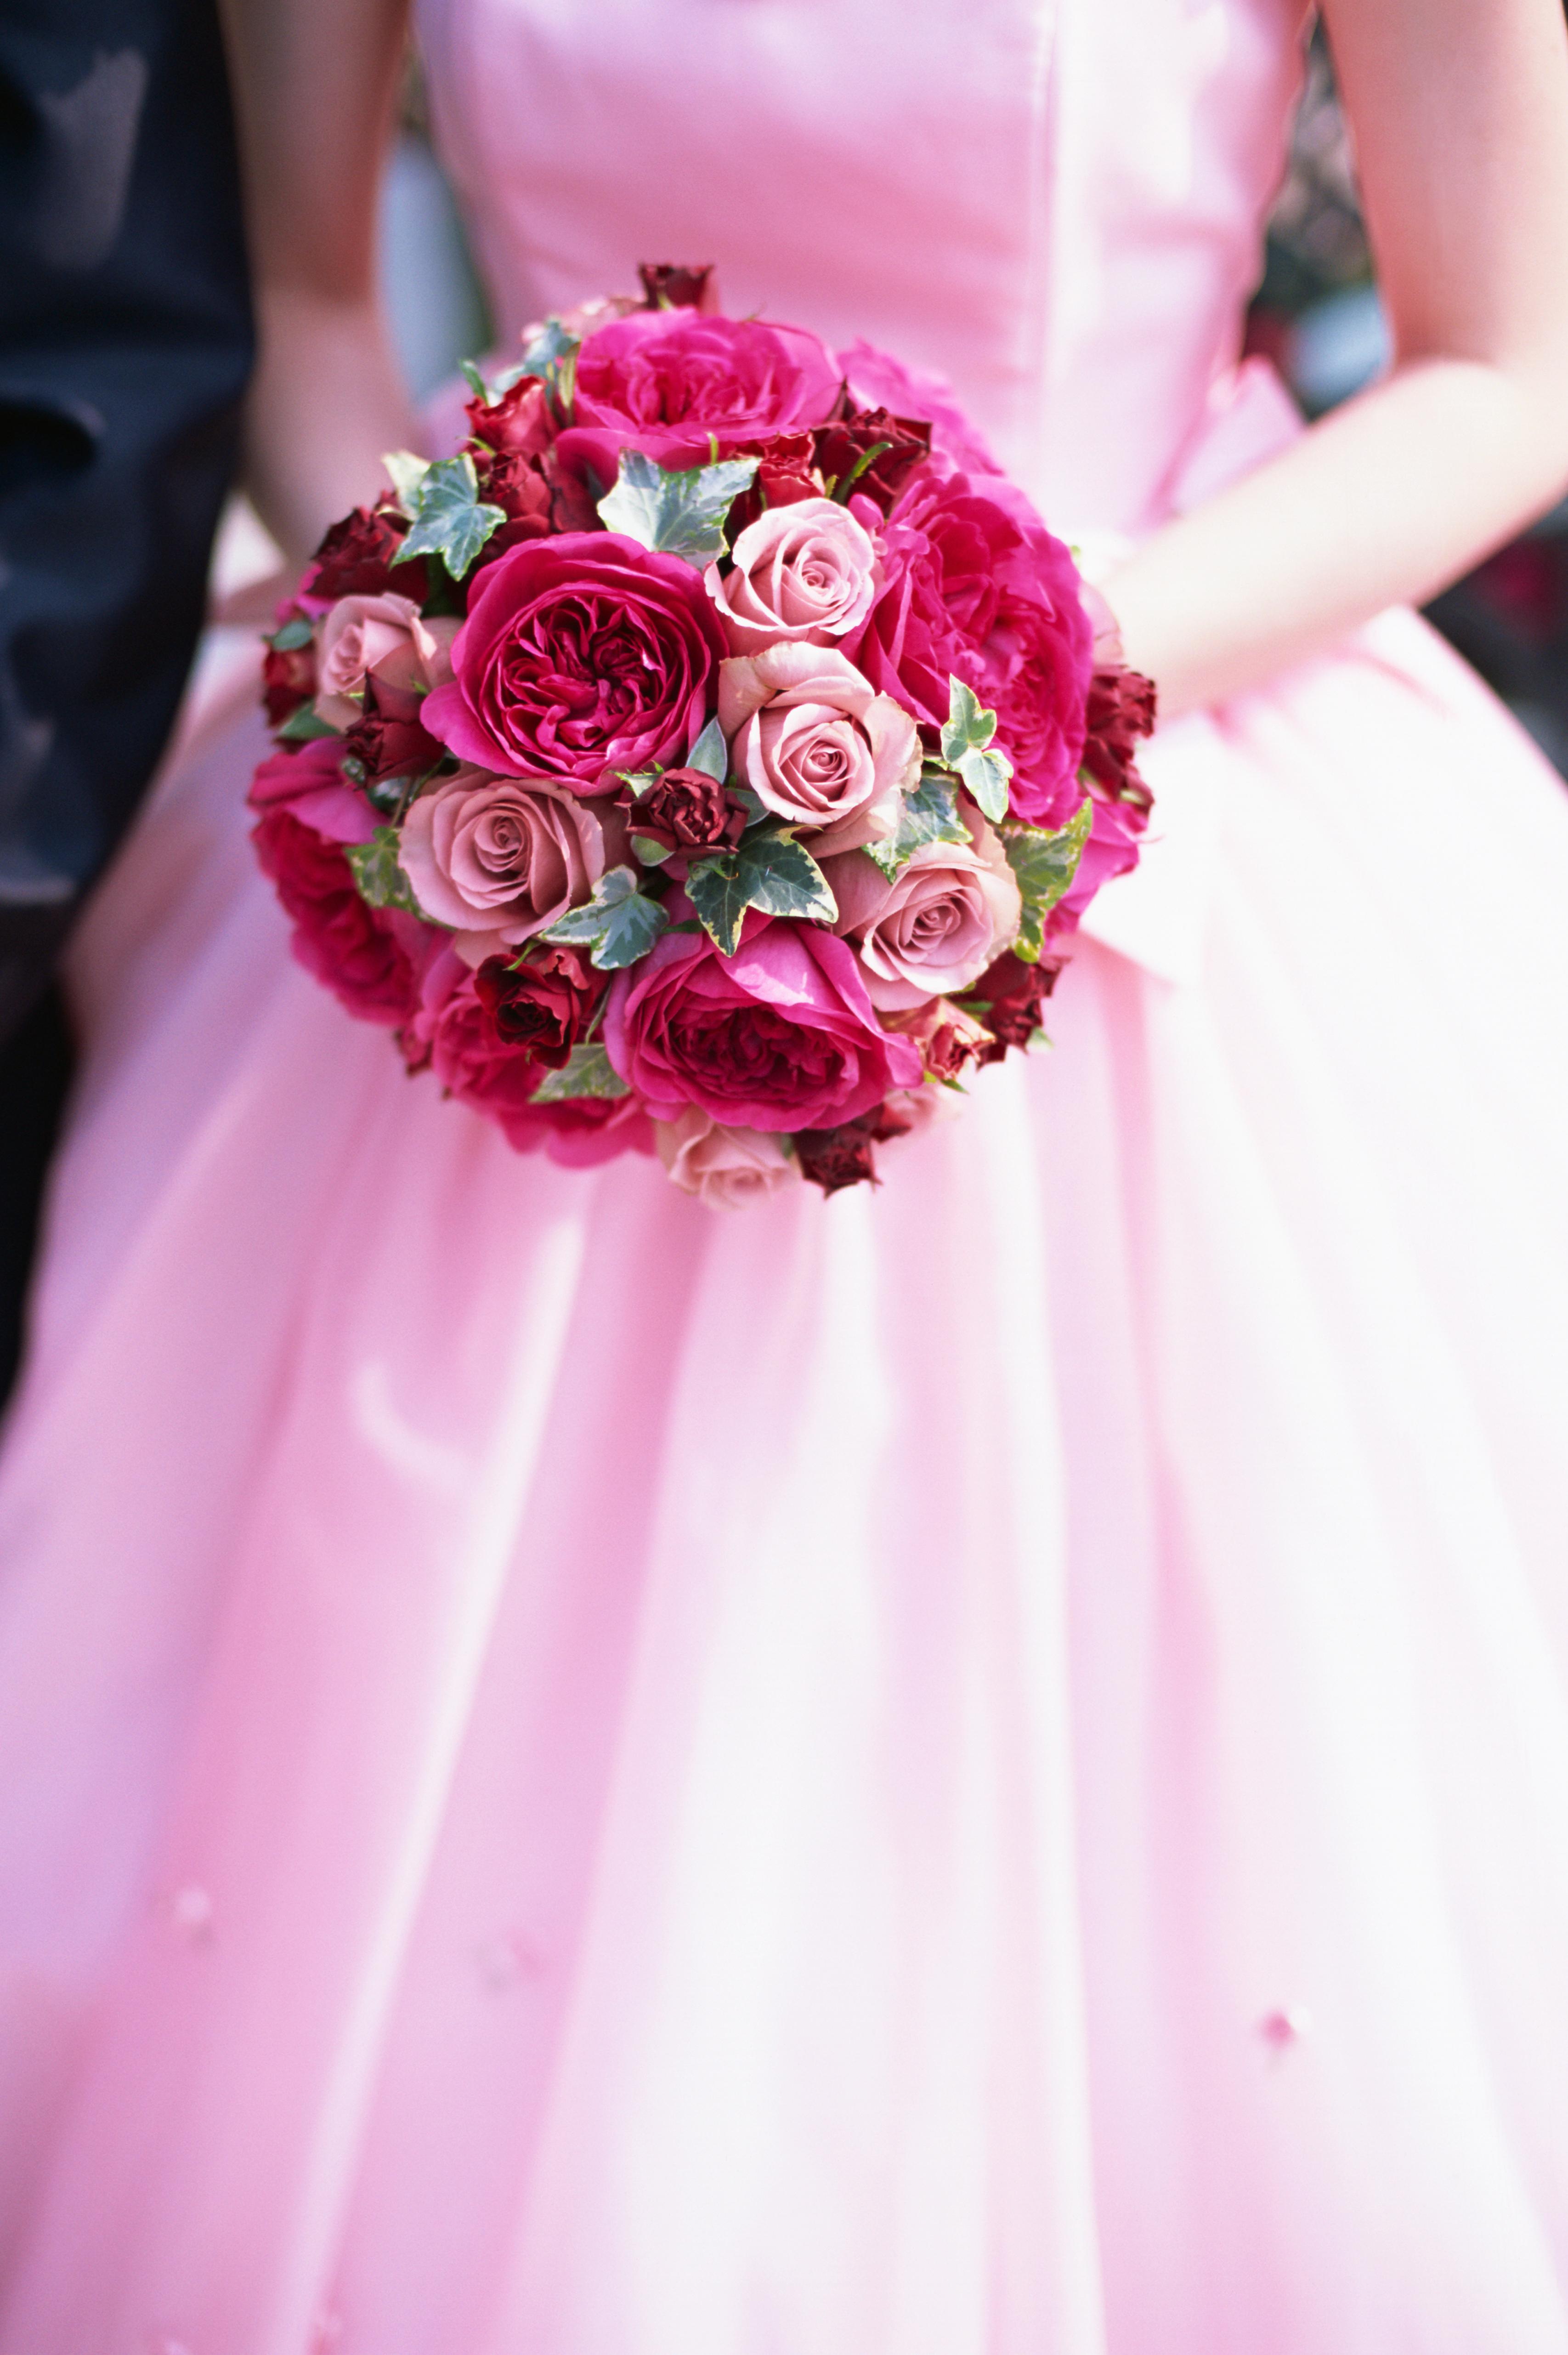 A pink bride holding a pink bouquet